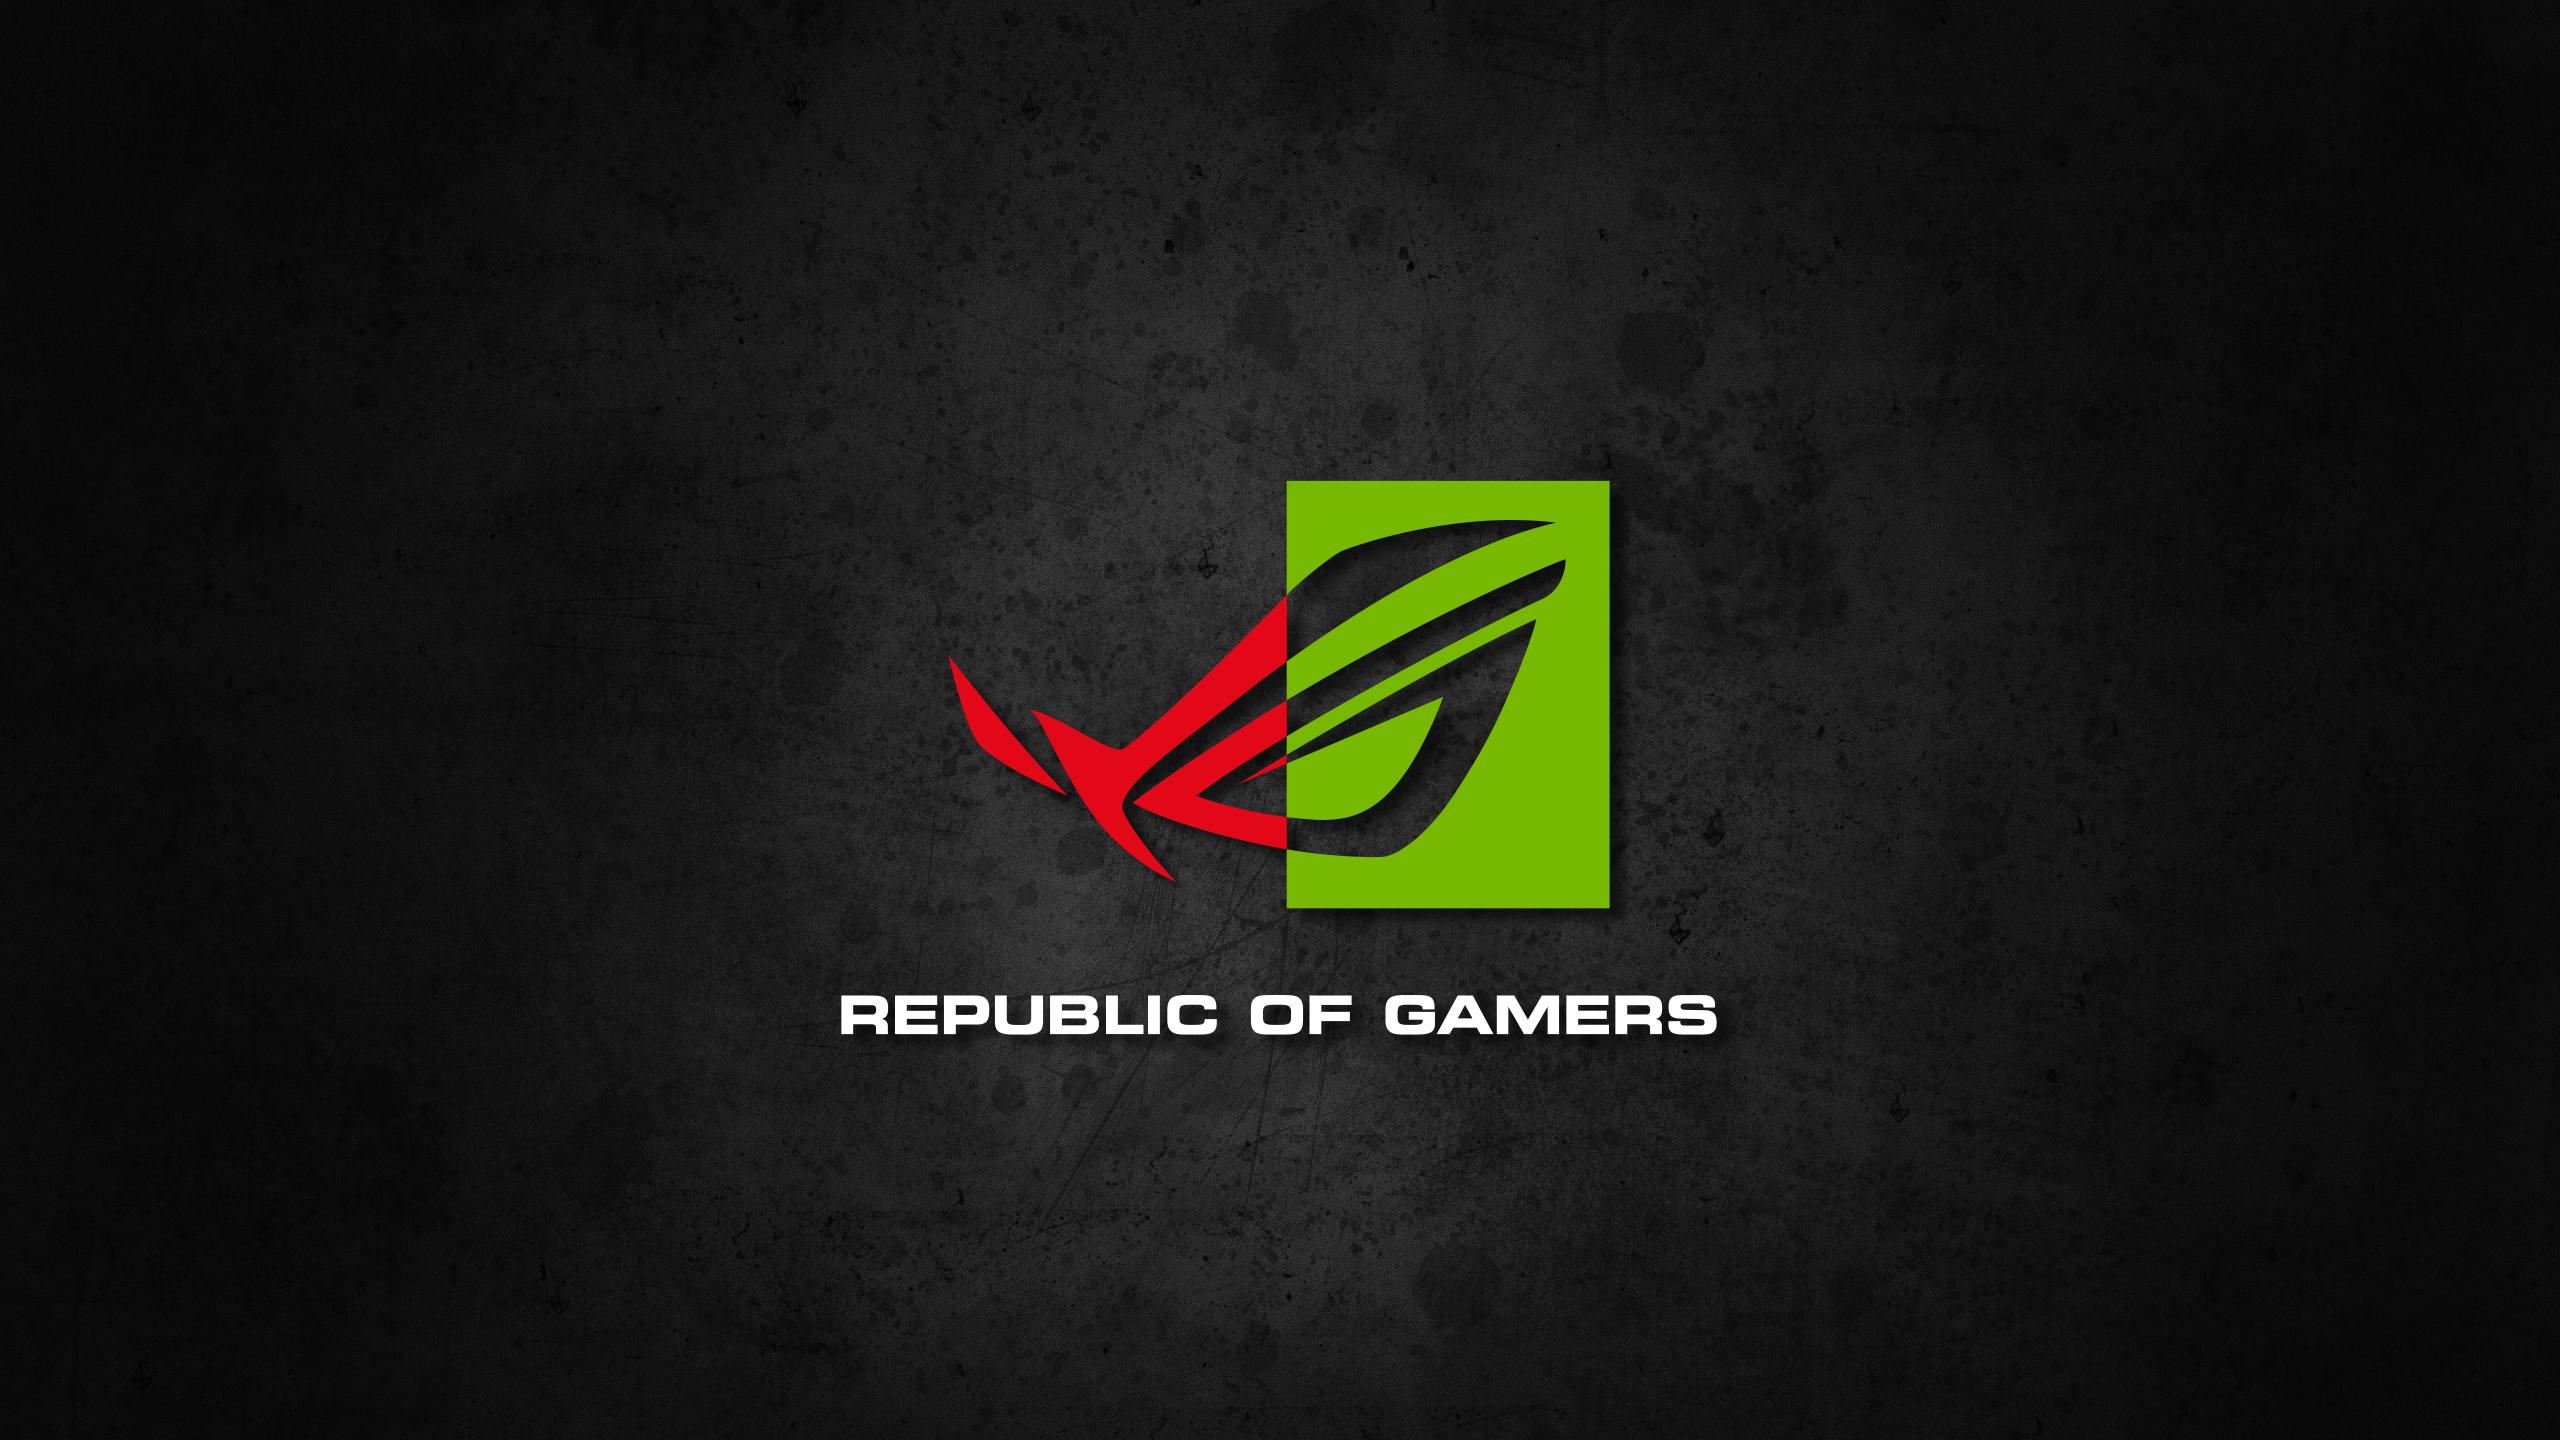 republic of gamers flat - photo #10